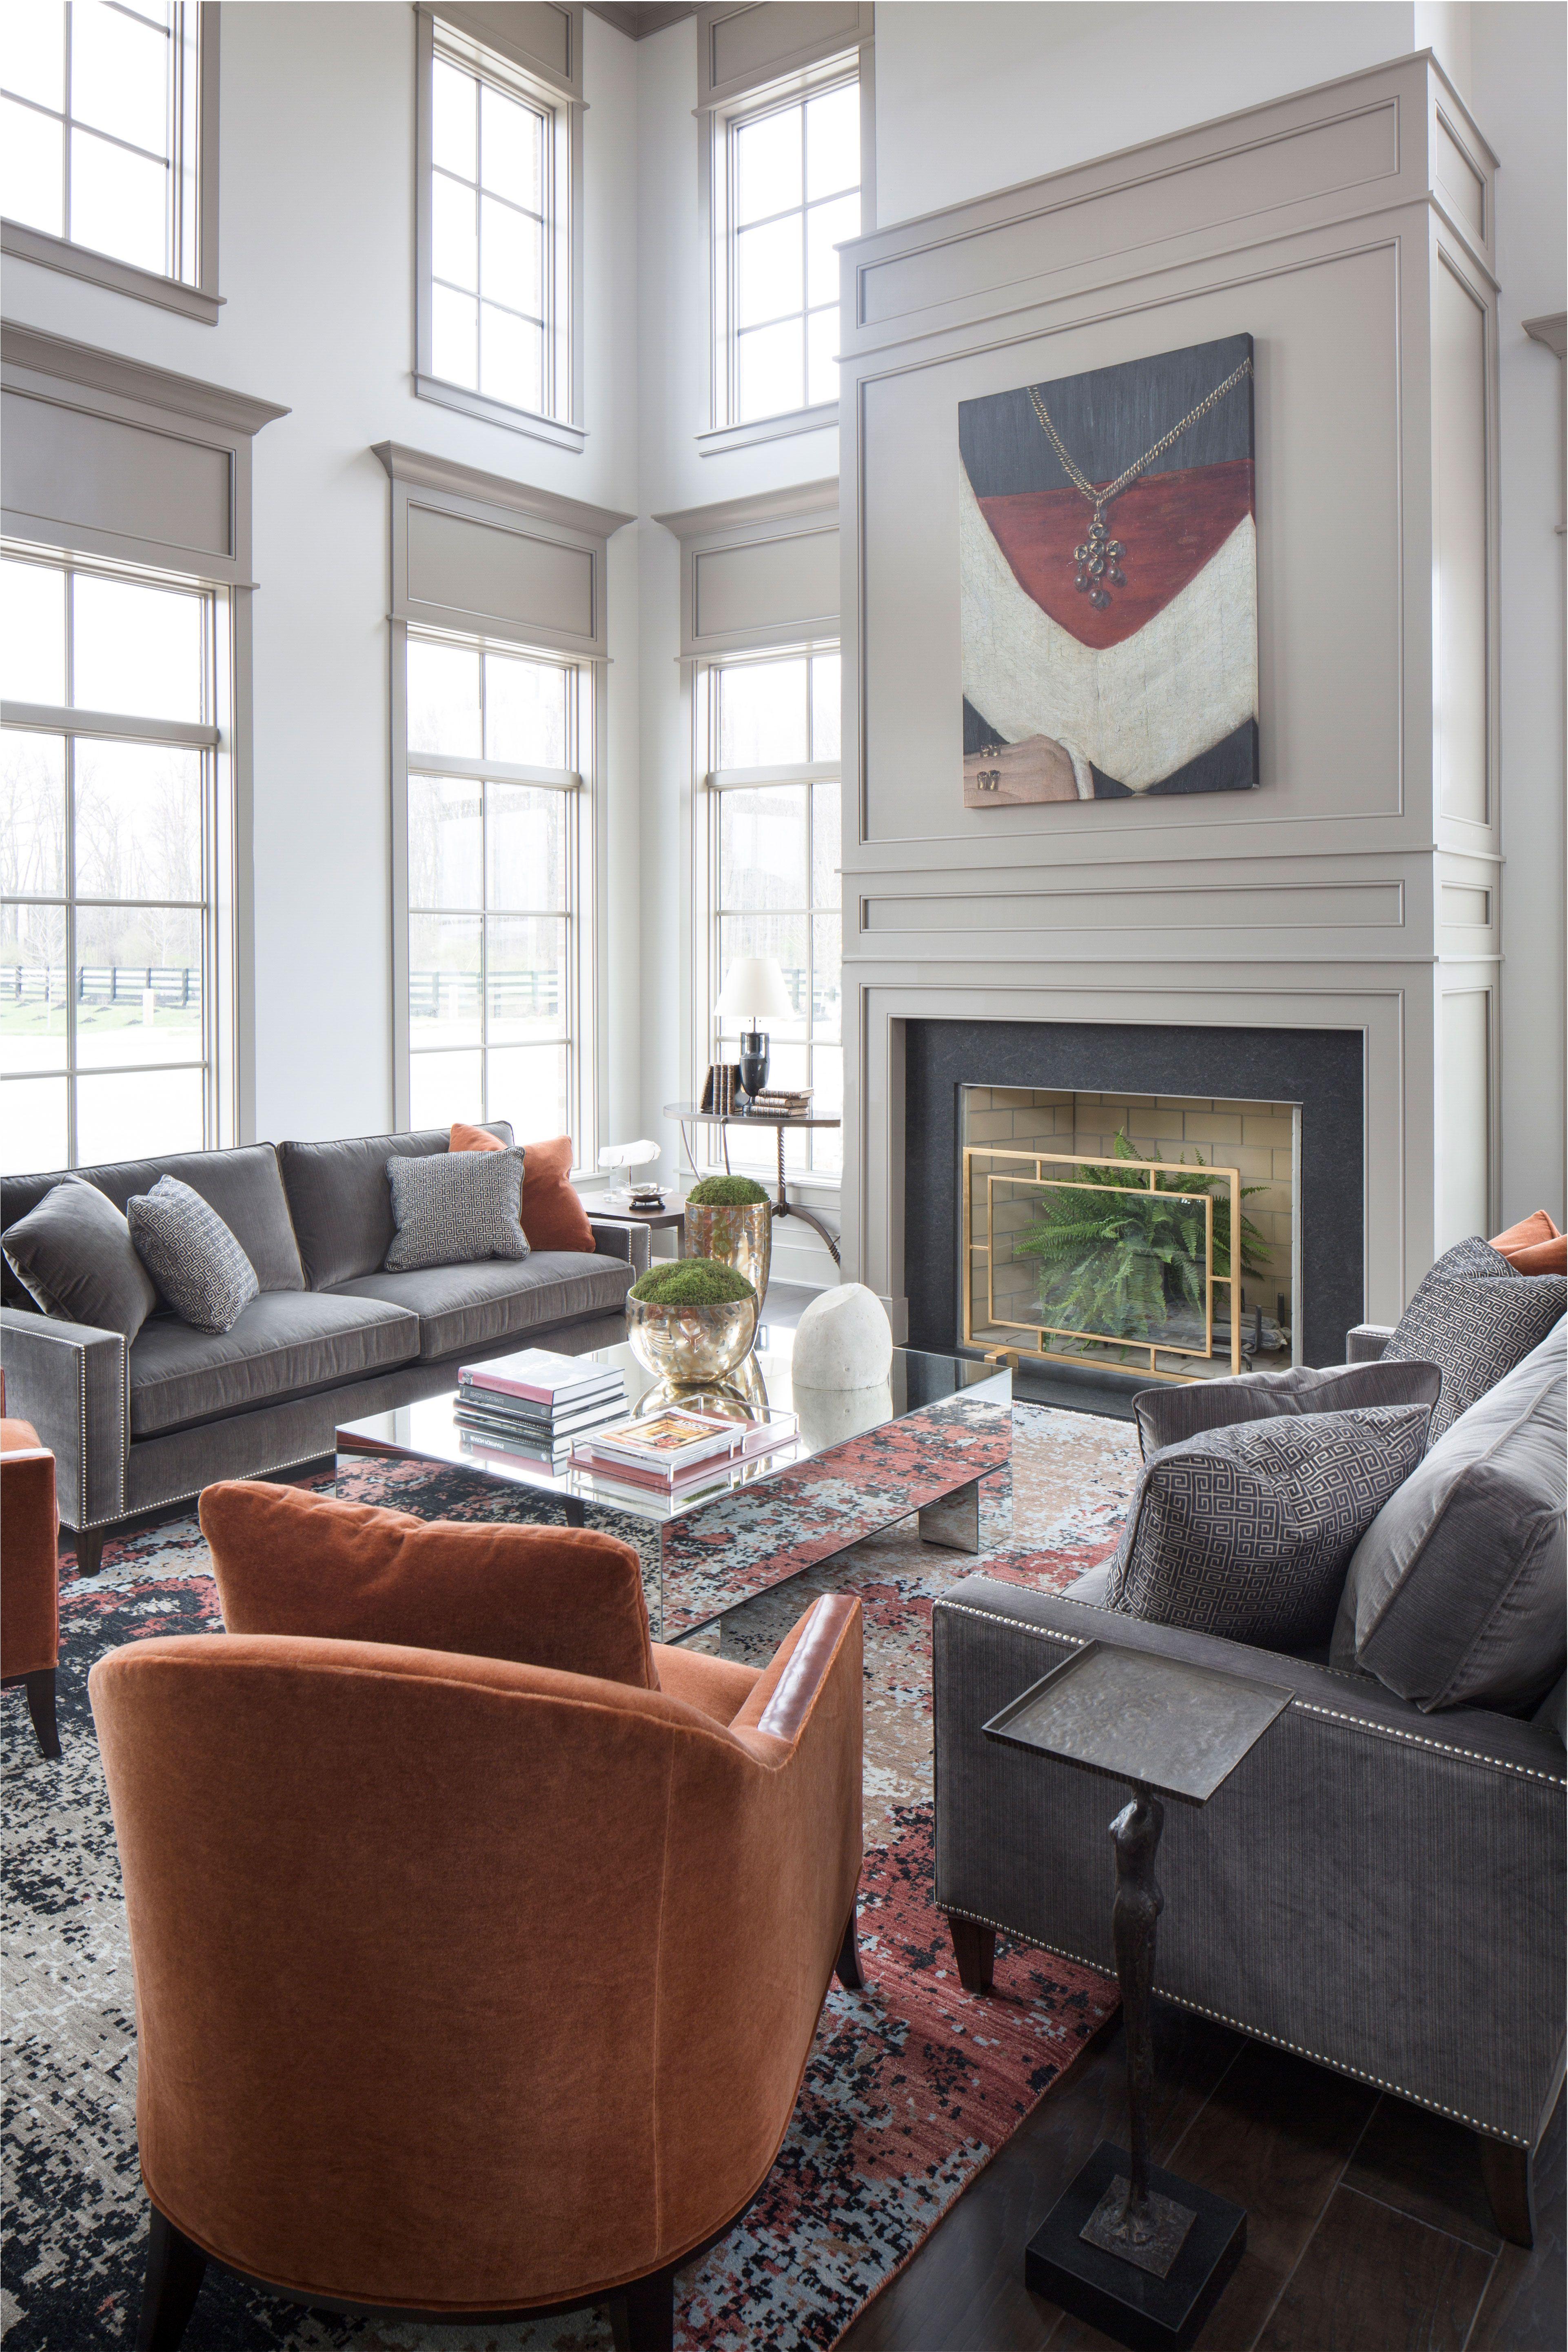 Designx kittle   furniture transitional style also show home rh pinterest